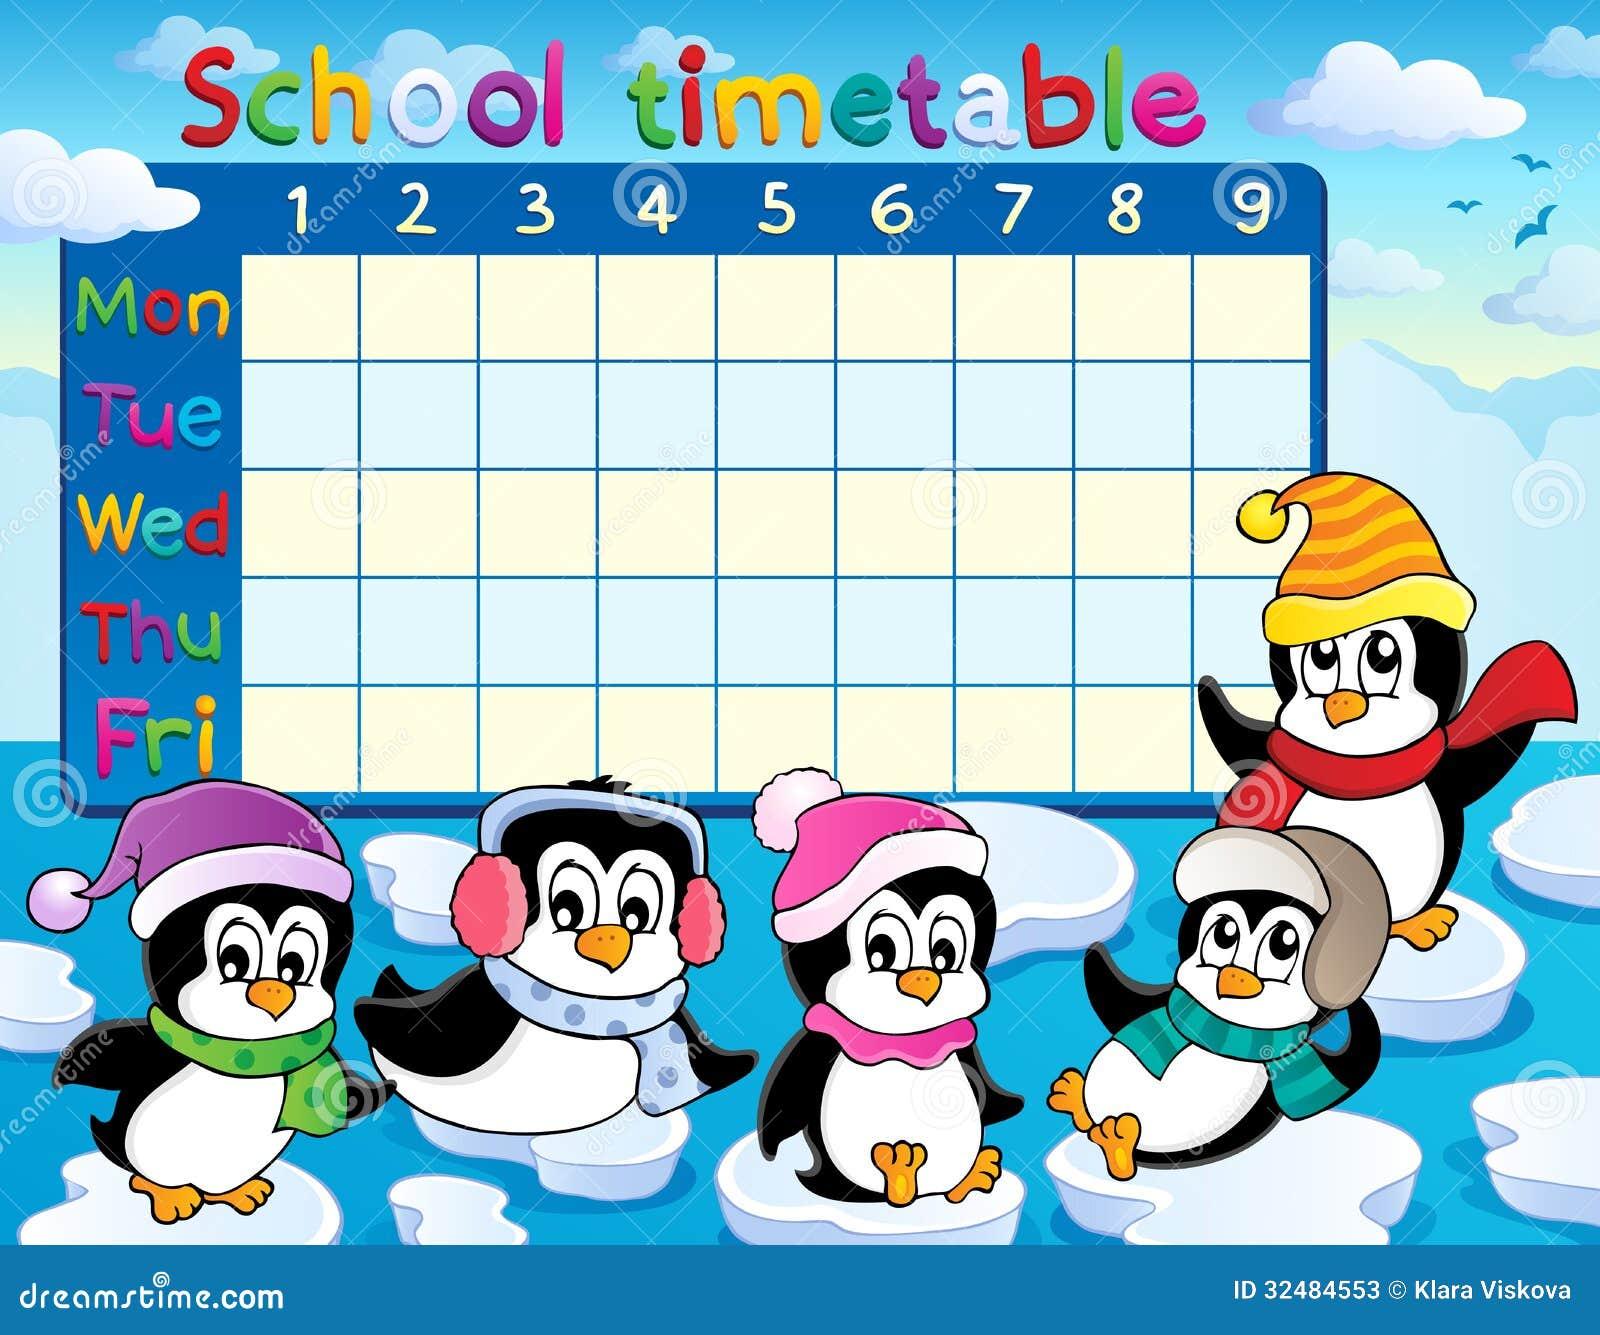 School Timetable Theme Image 9 Stock Photos - Image: 32484553